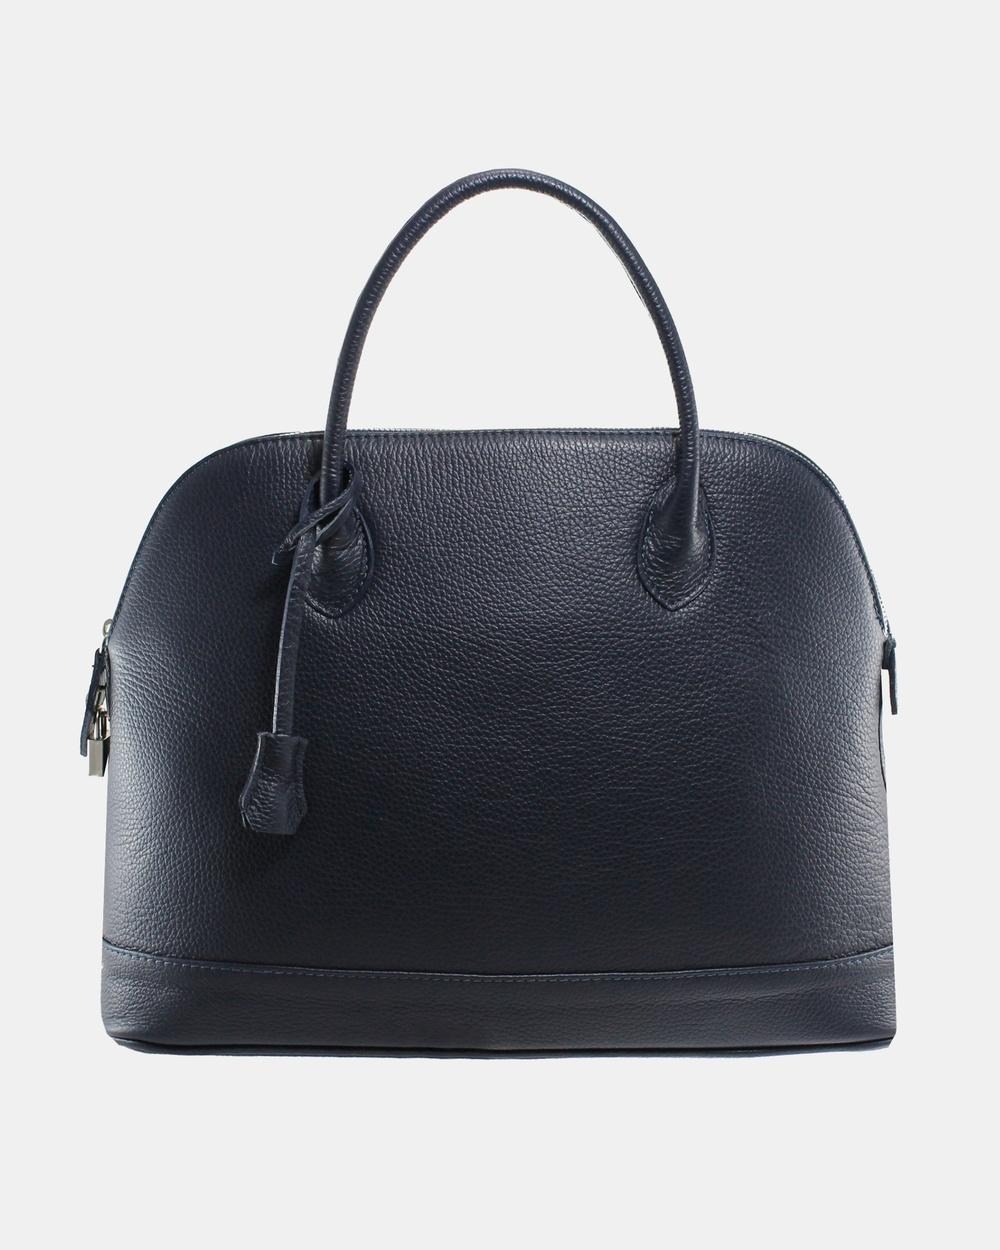 Lux Haide Olivia Tote Handbag Handbags Navy